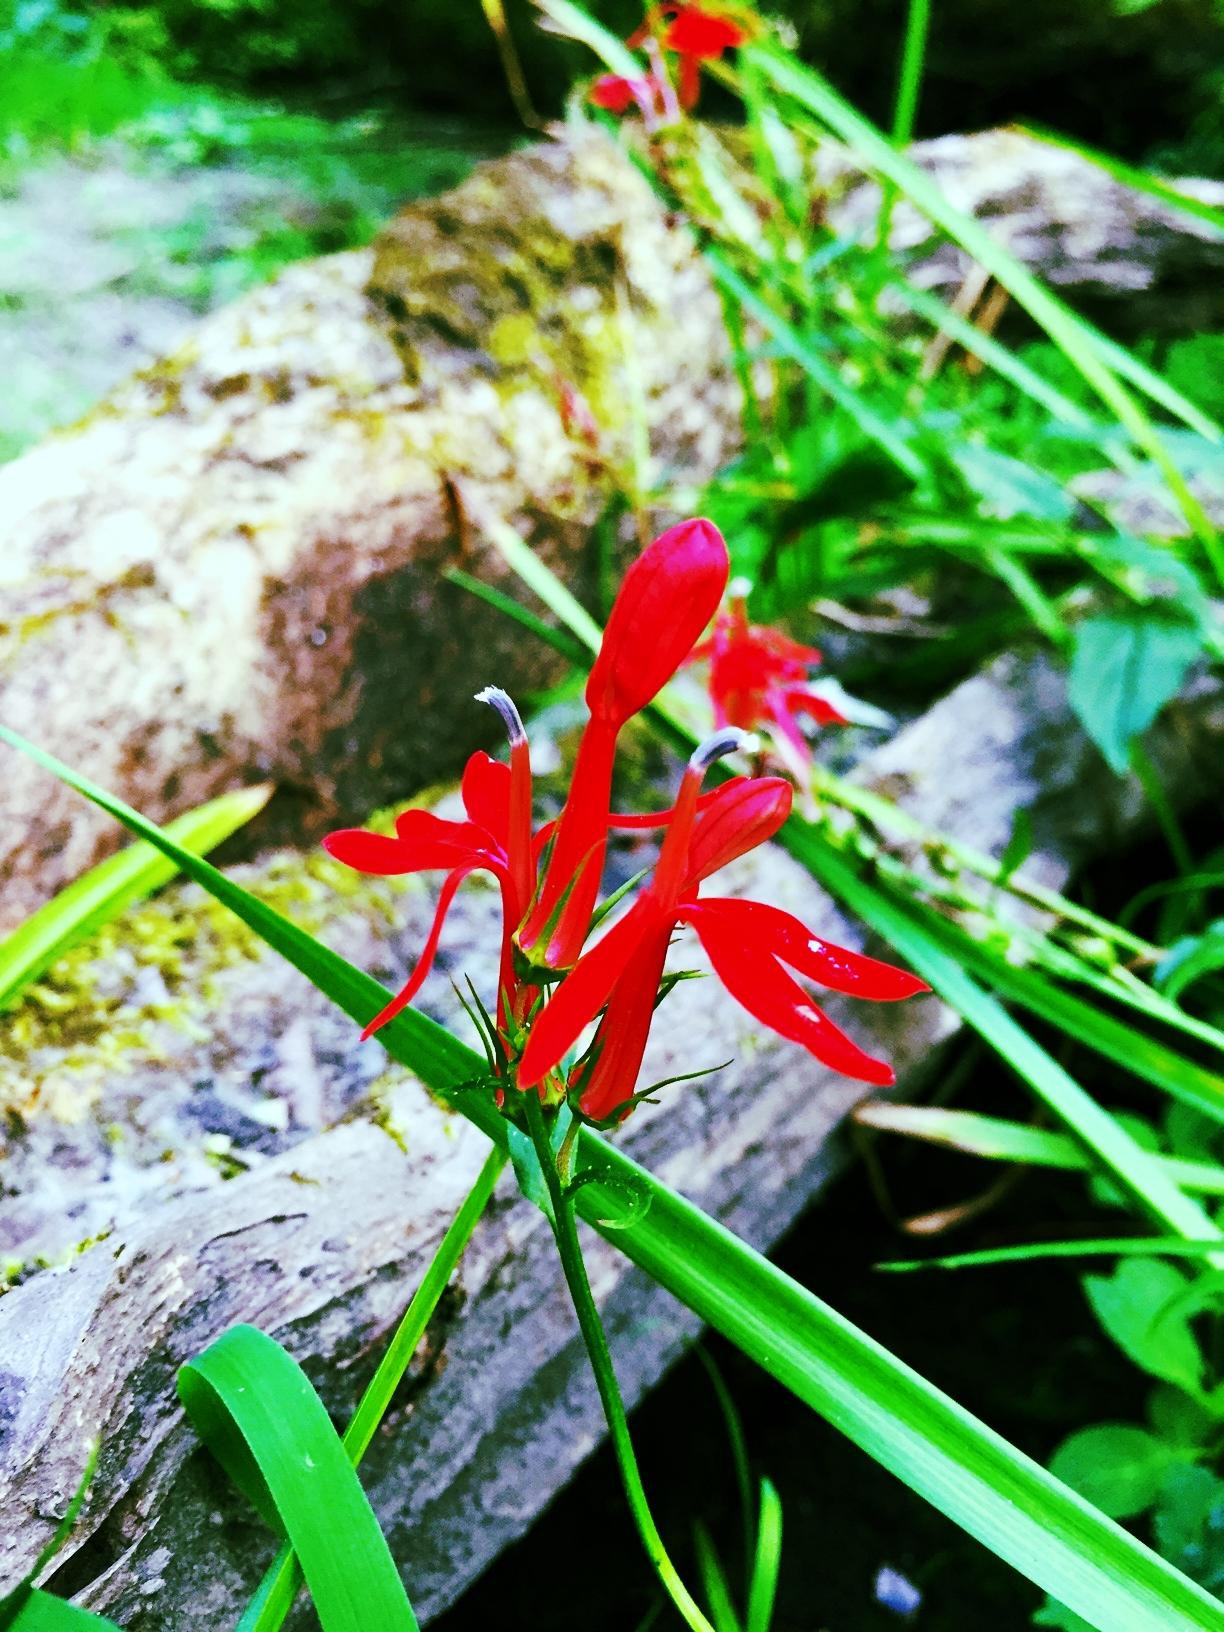 Cardinal Flower in Dry Brook, Charles River Woods